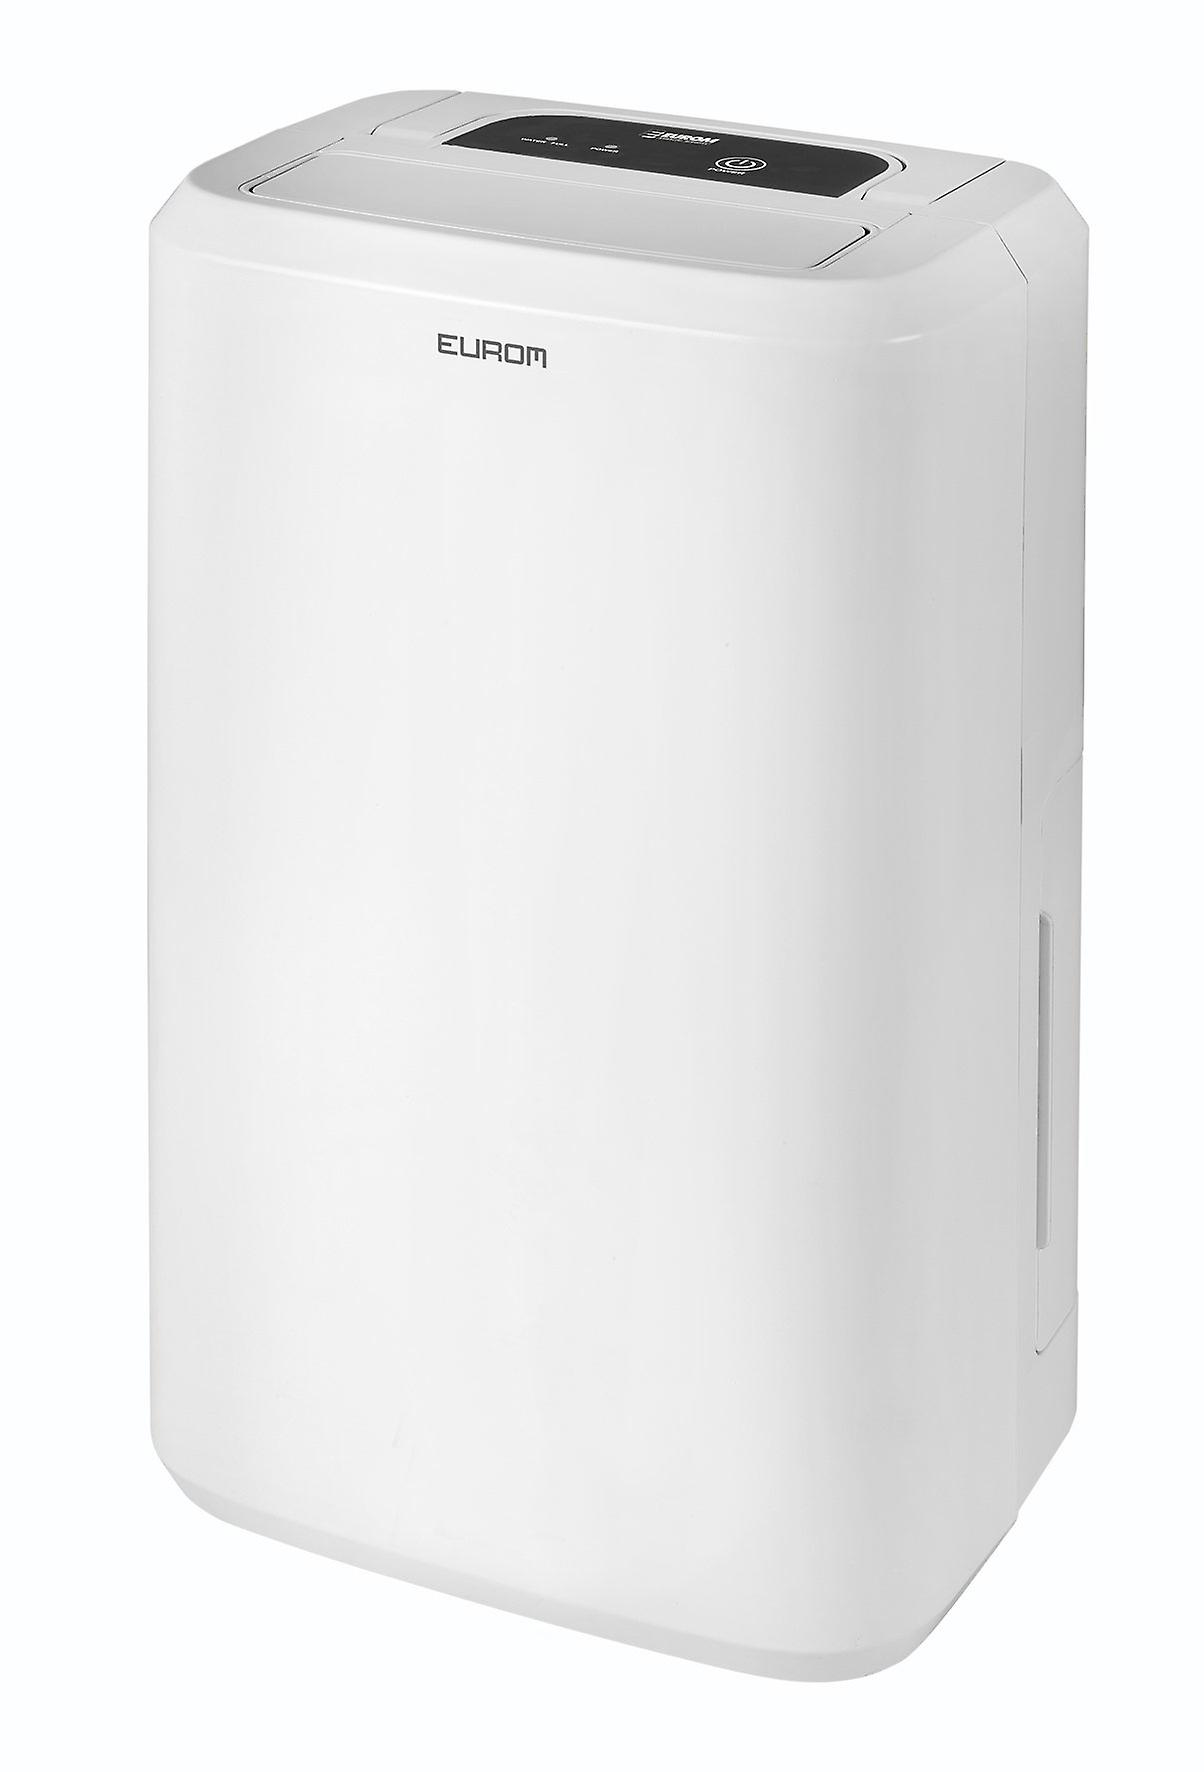 Eurom DryBest 10-Dehumidifier